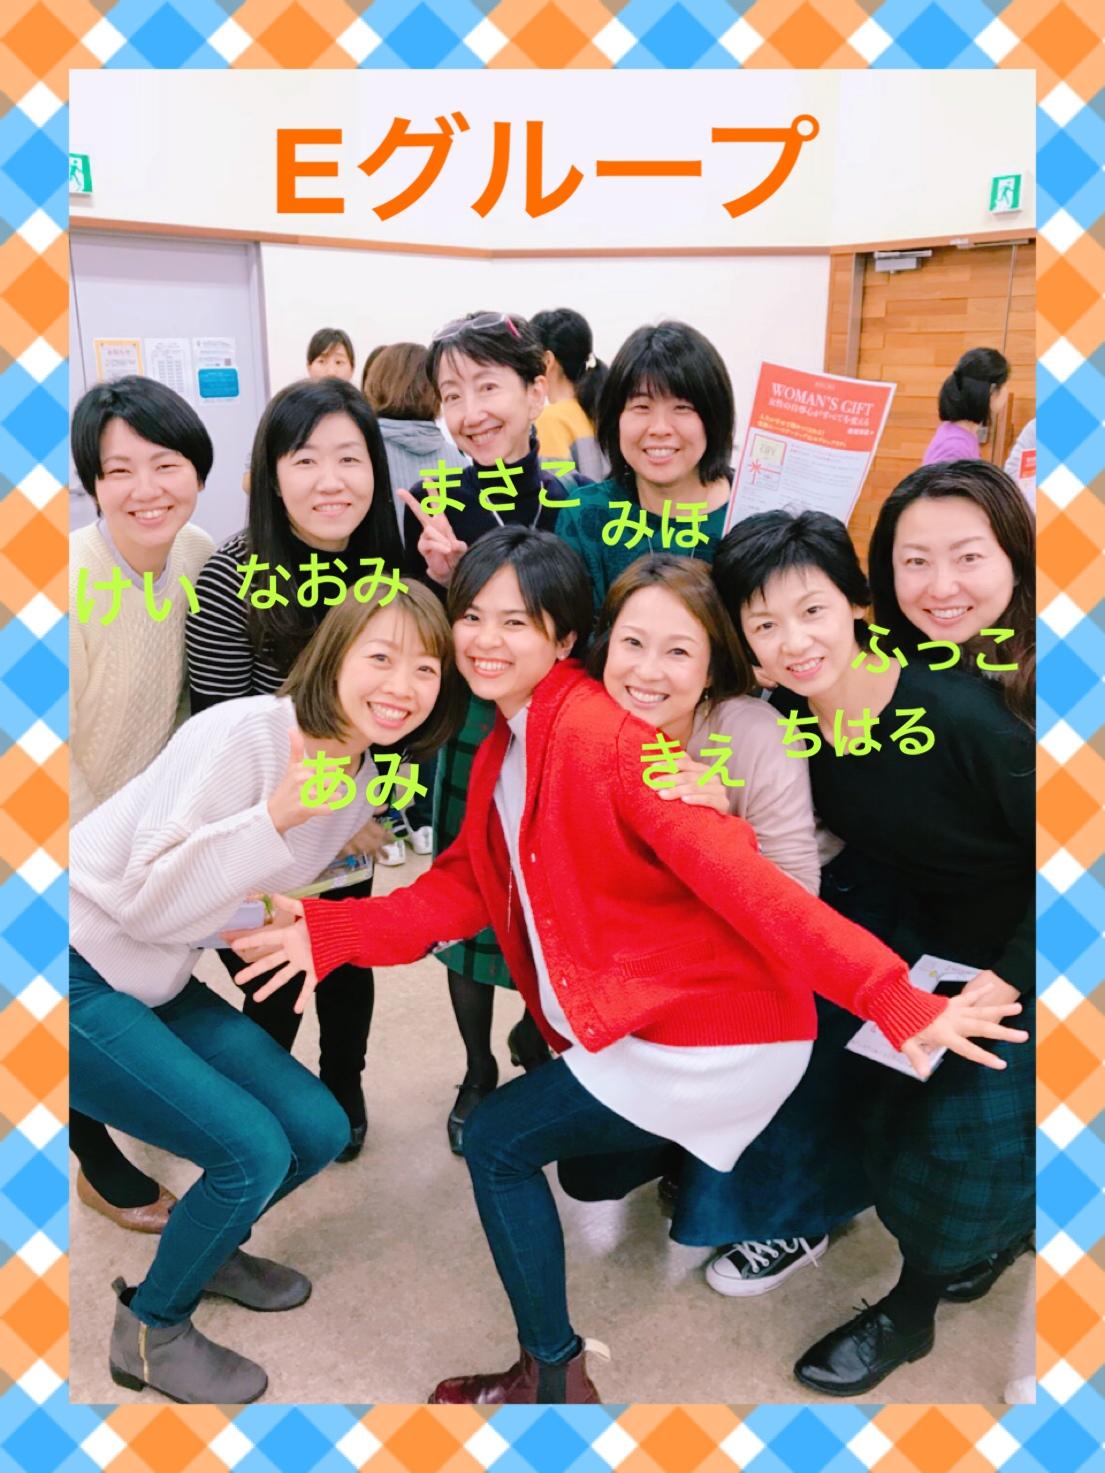 2020/1/28 1010HAPPY 藤沢クラス Eグループ